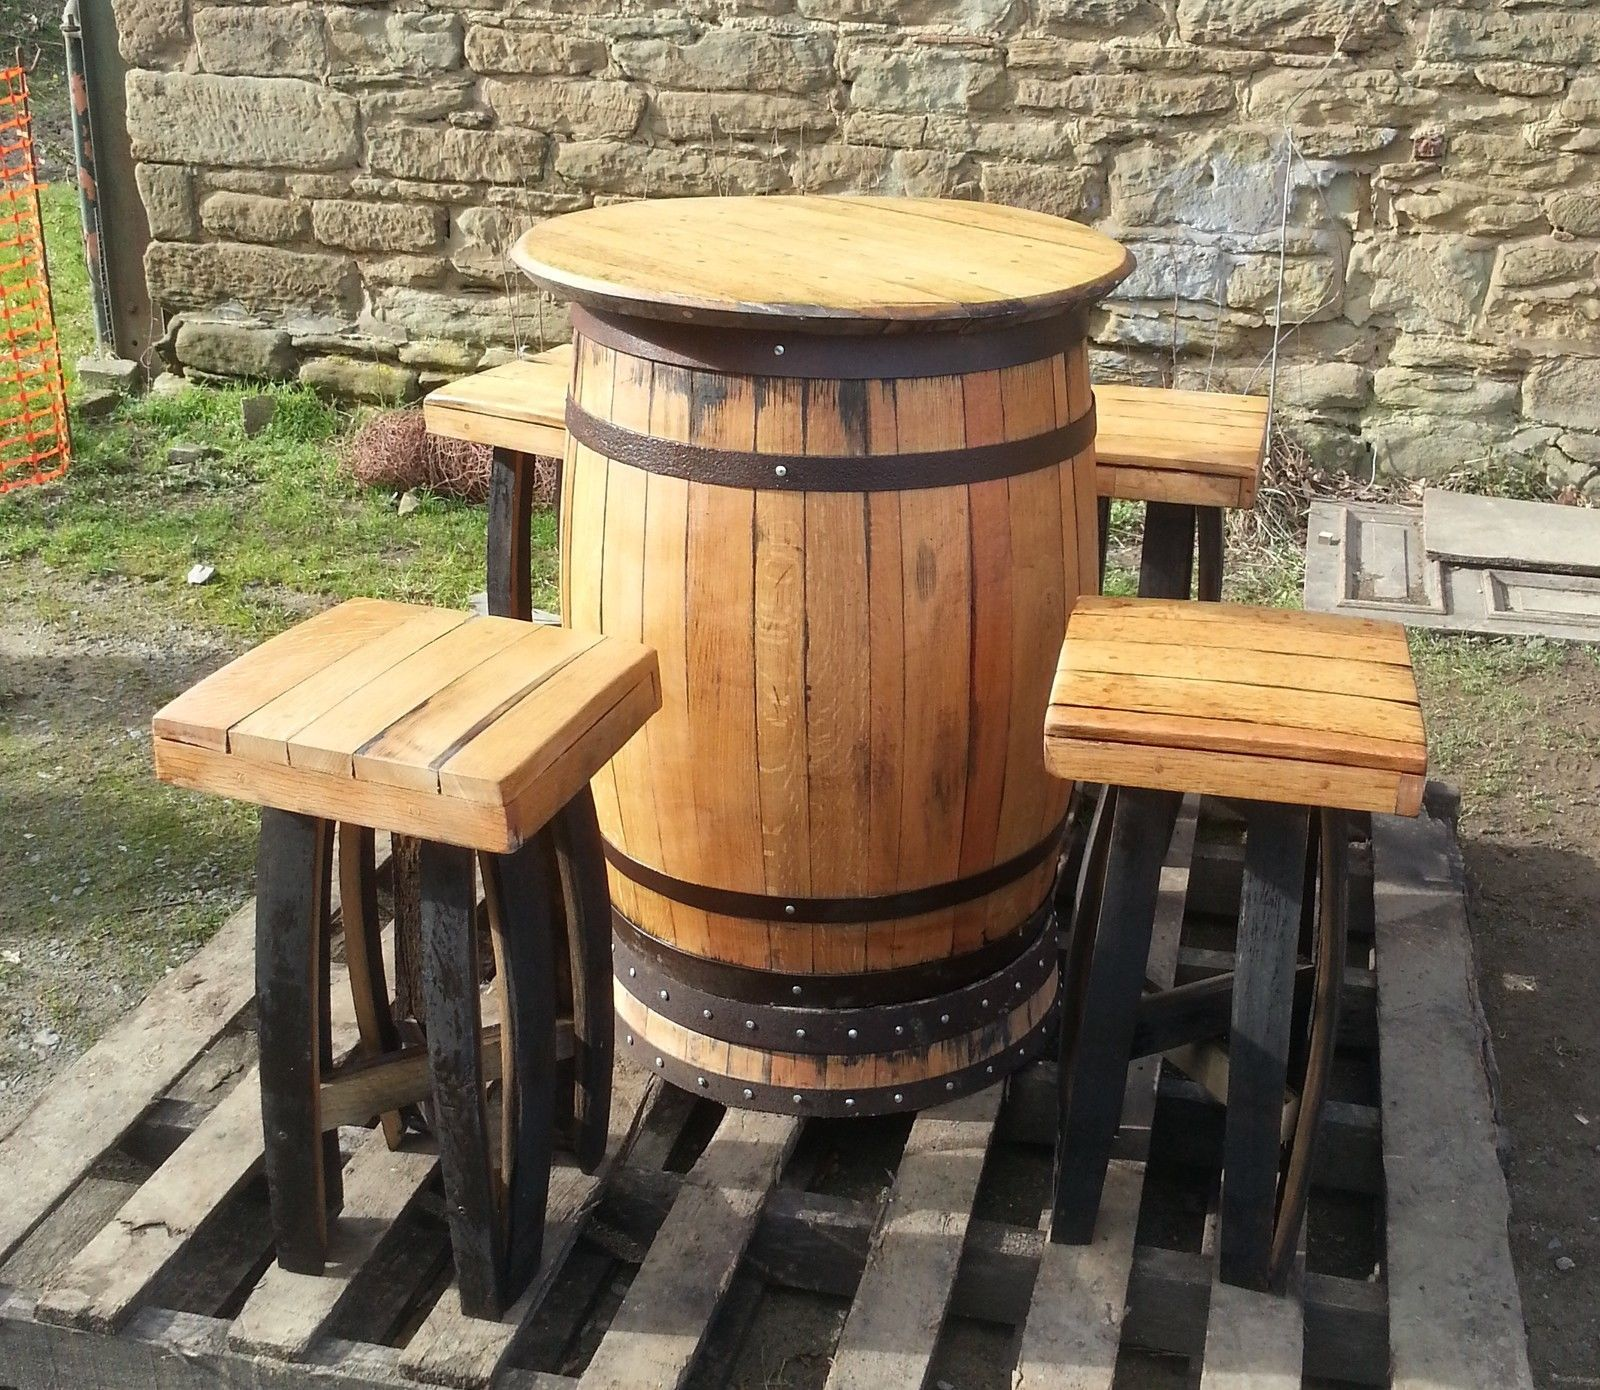 Oak whisky barrel bar table and 4 stools set - made from recycled whisky casks   & Oak whisky barrel bar table and 4 stools set - made from recycled ...